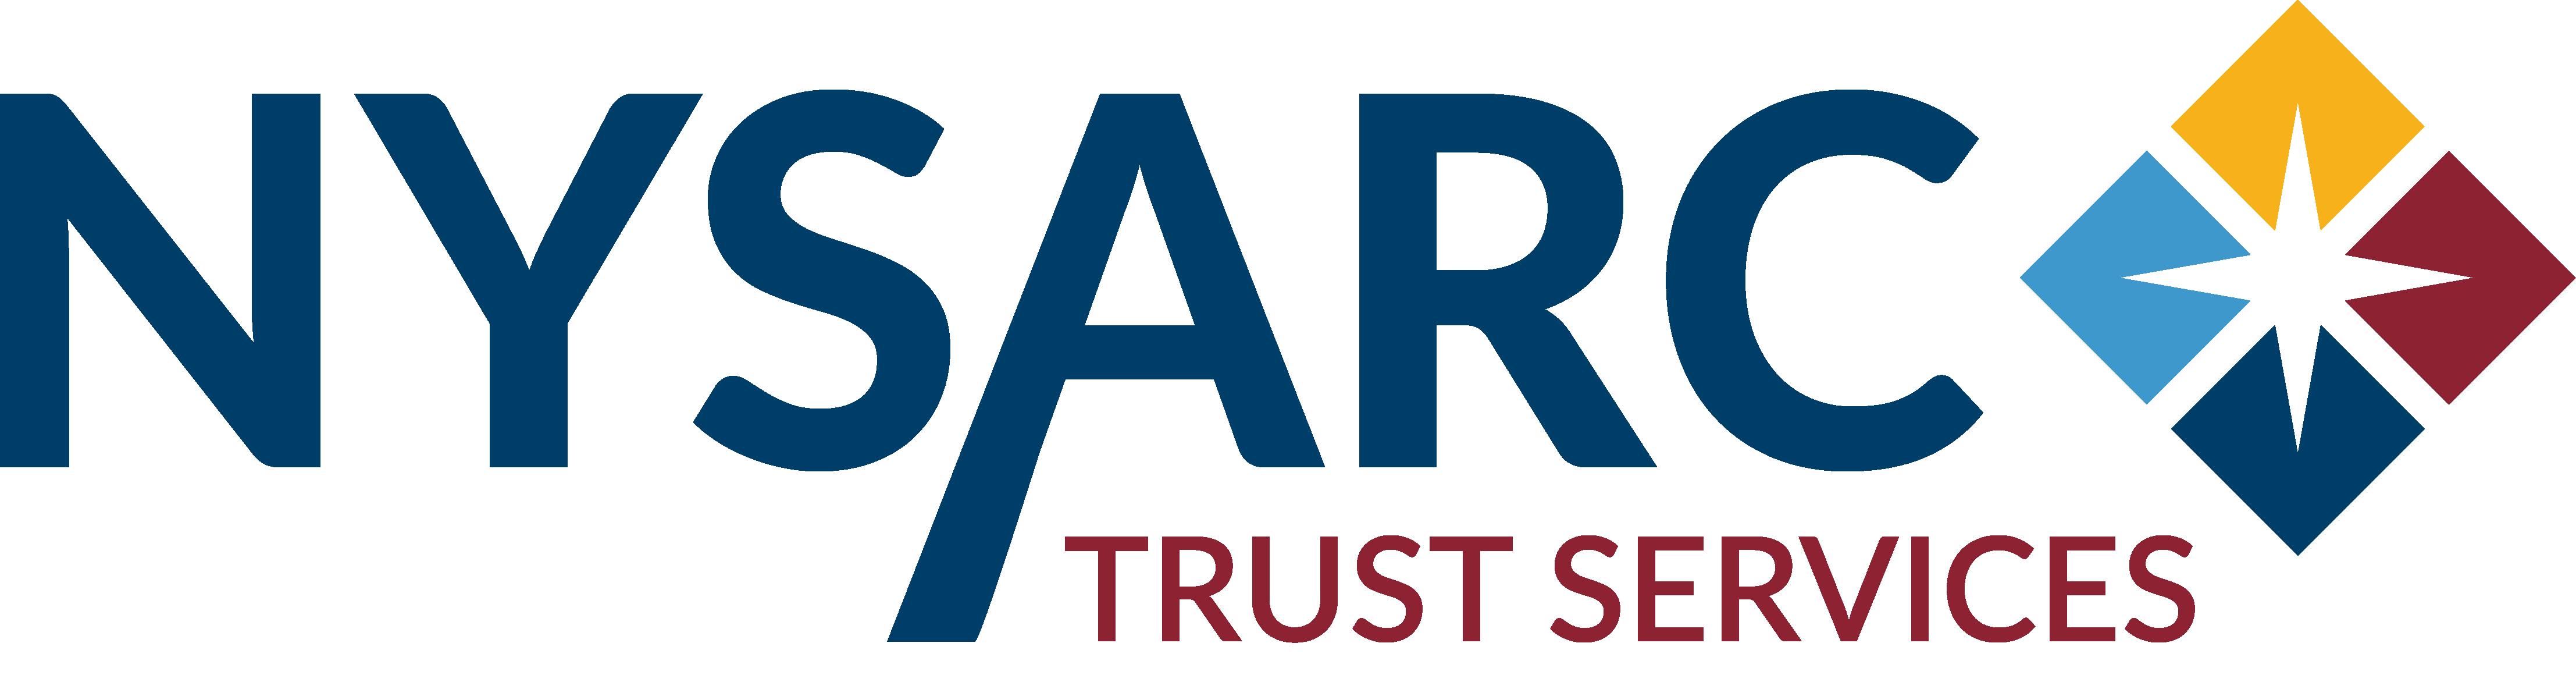 media/NYSARC Trust Services 2017 LOGO - New Color CMYK.png